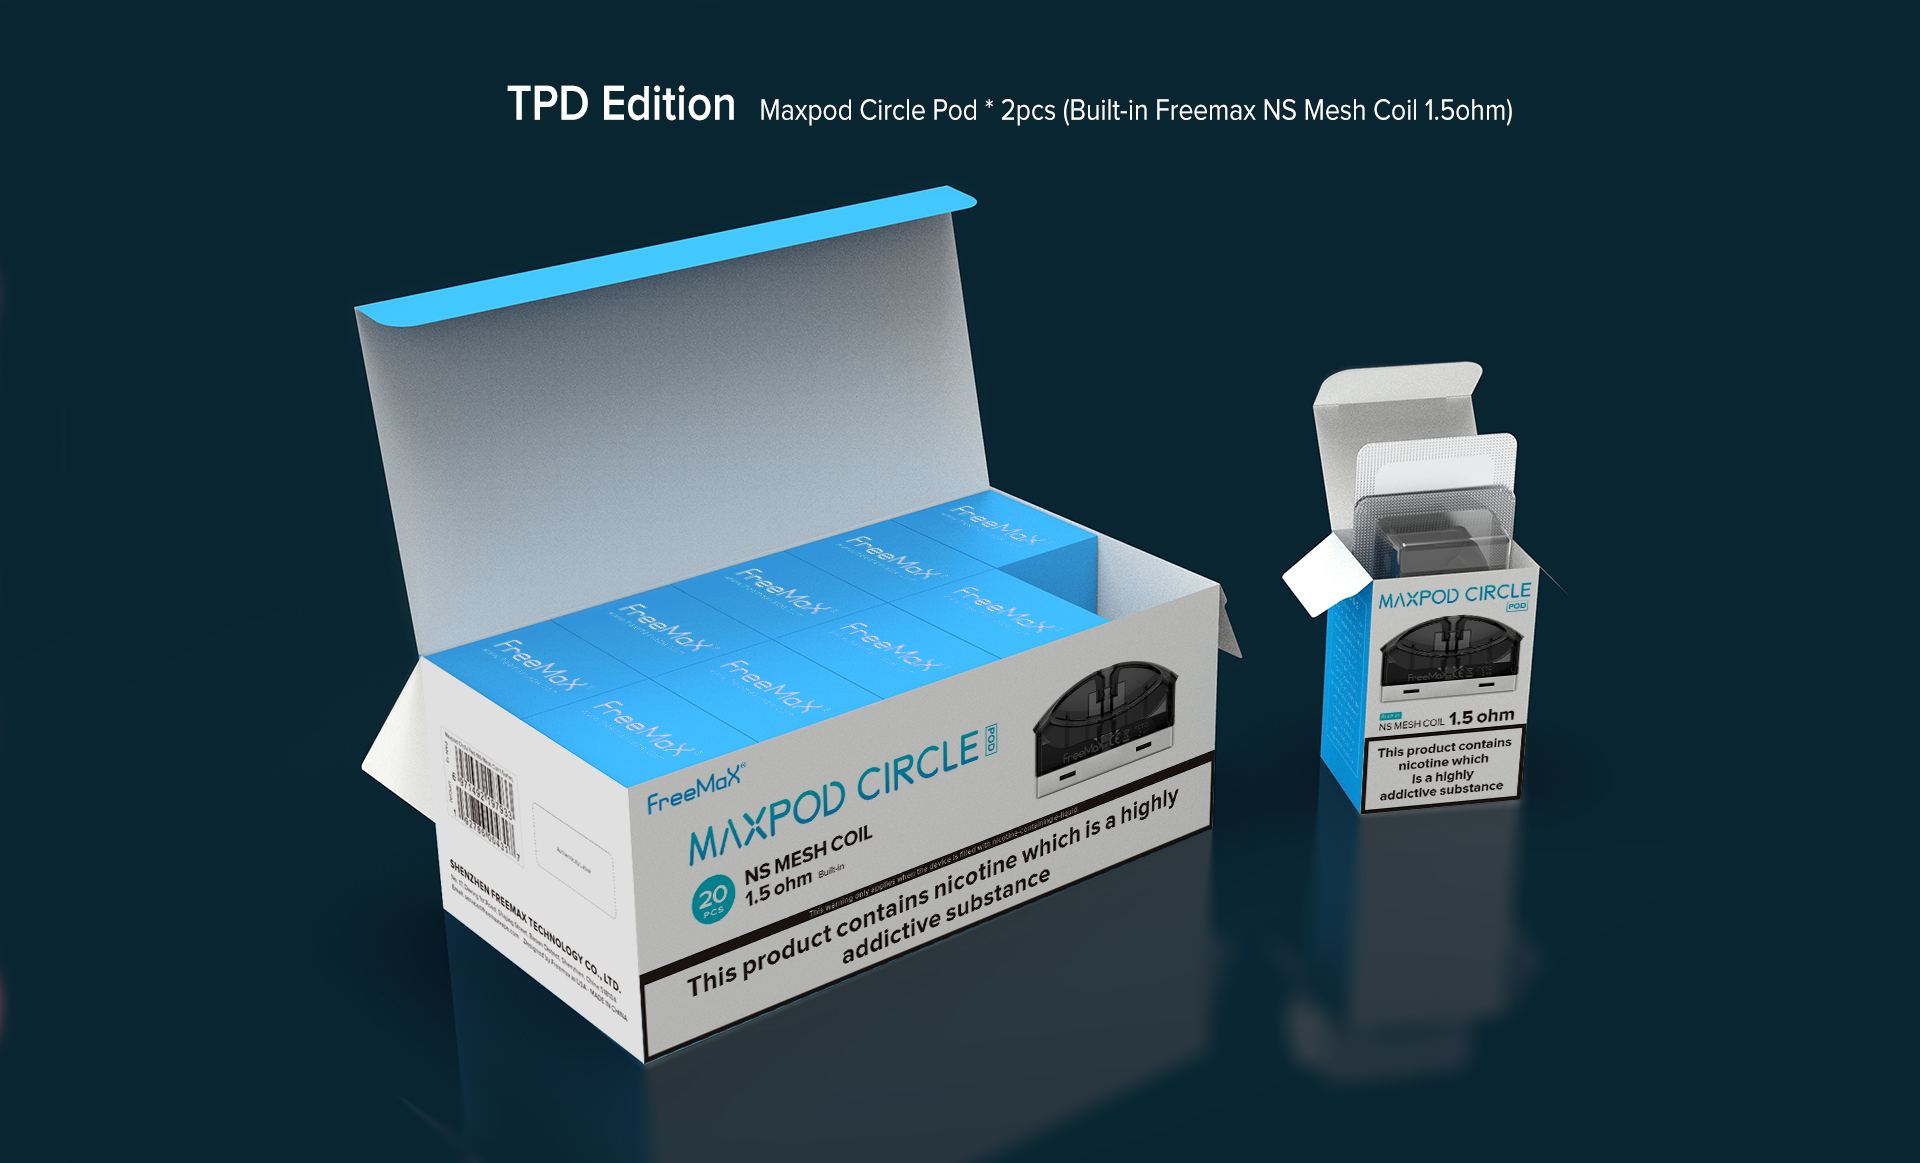 Maxpod-Circle-Pod-TPD-Edition